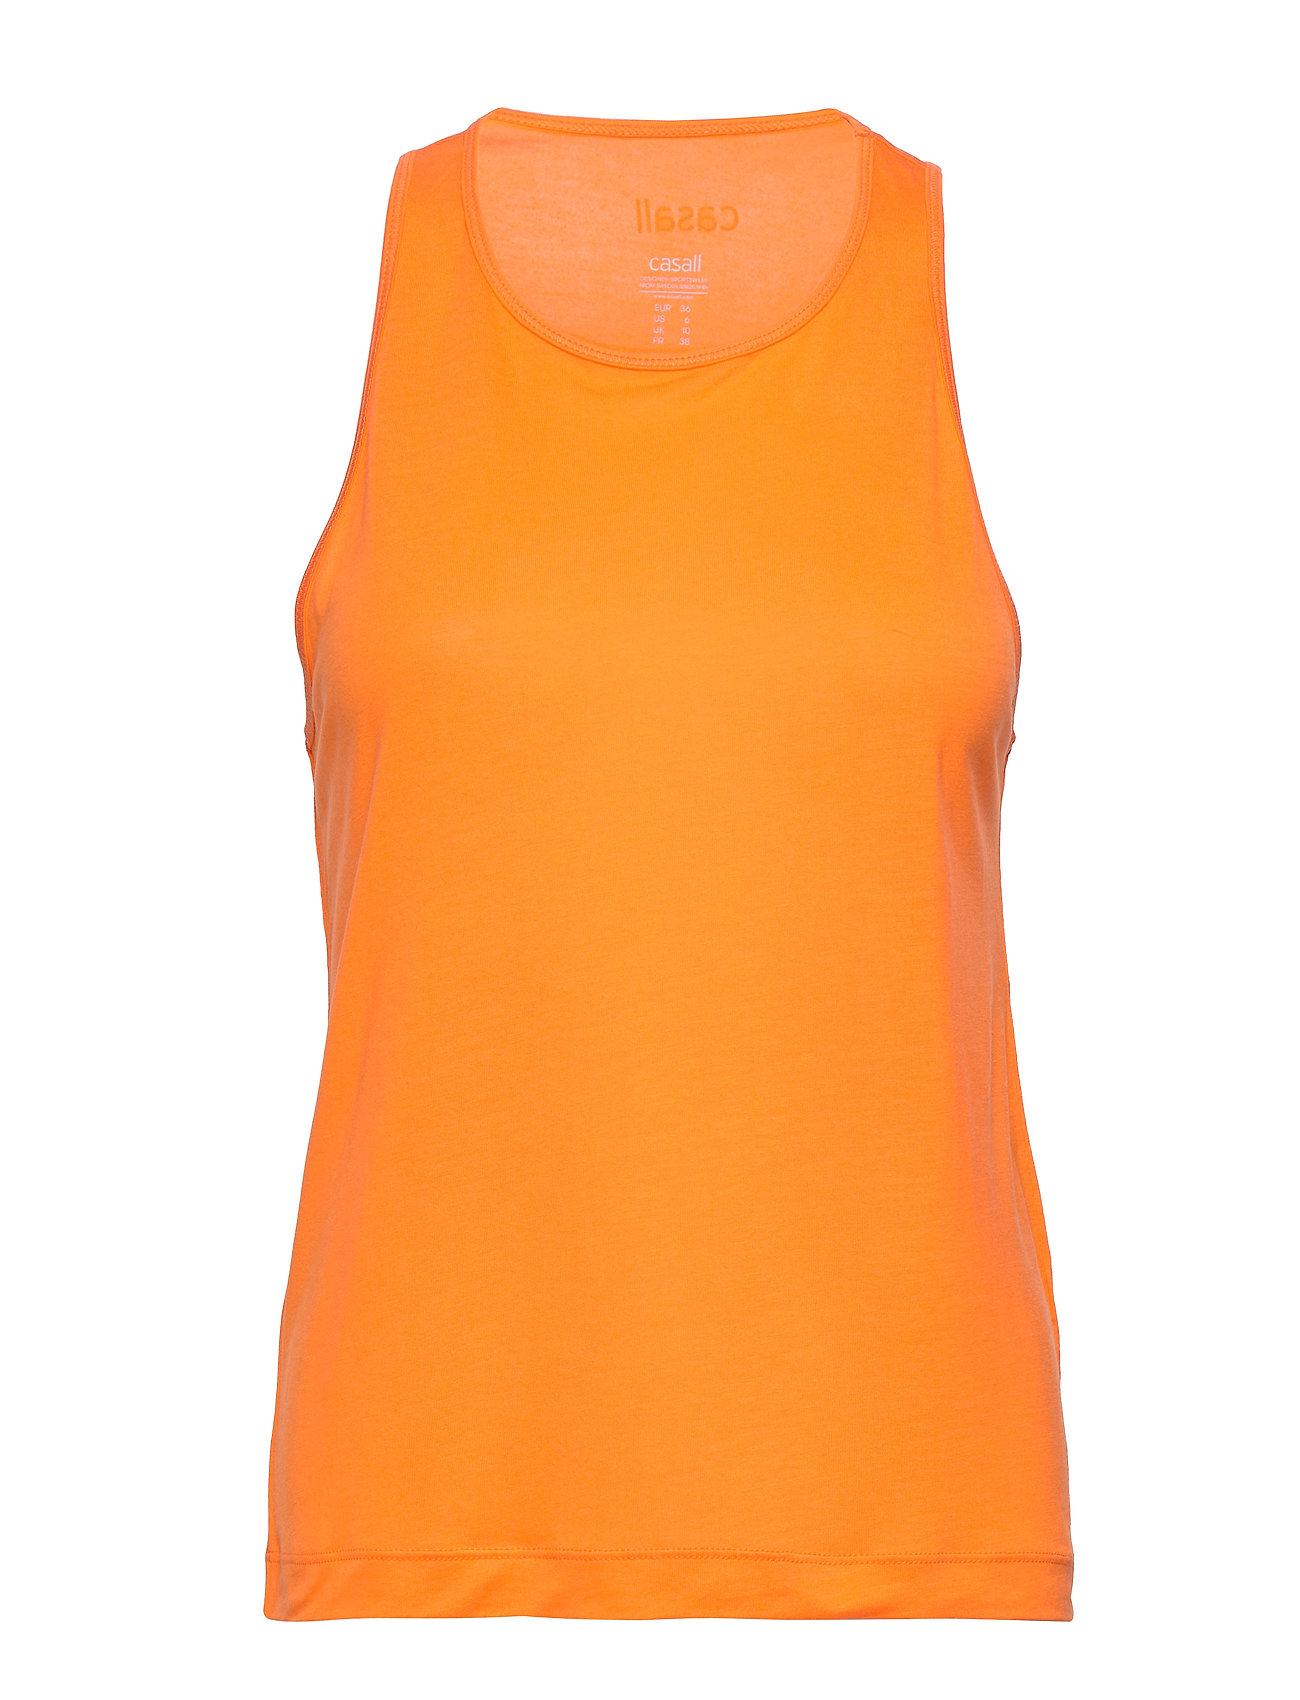 Image of Liquid Tencel Tank Top Ærmeløs Top Orange Casall (3327442559)